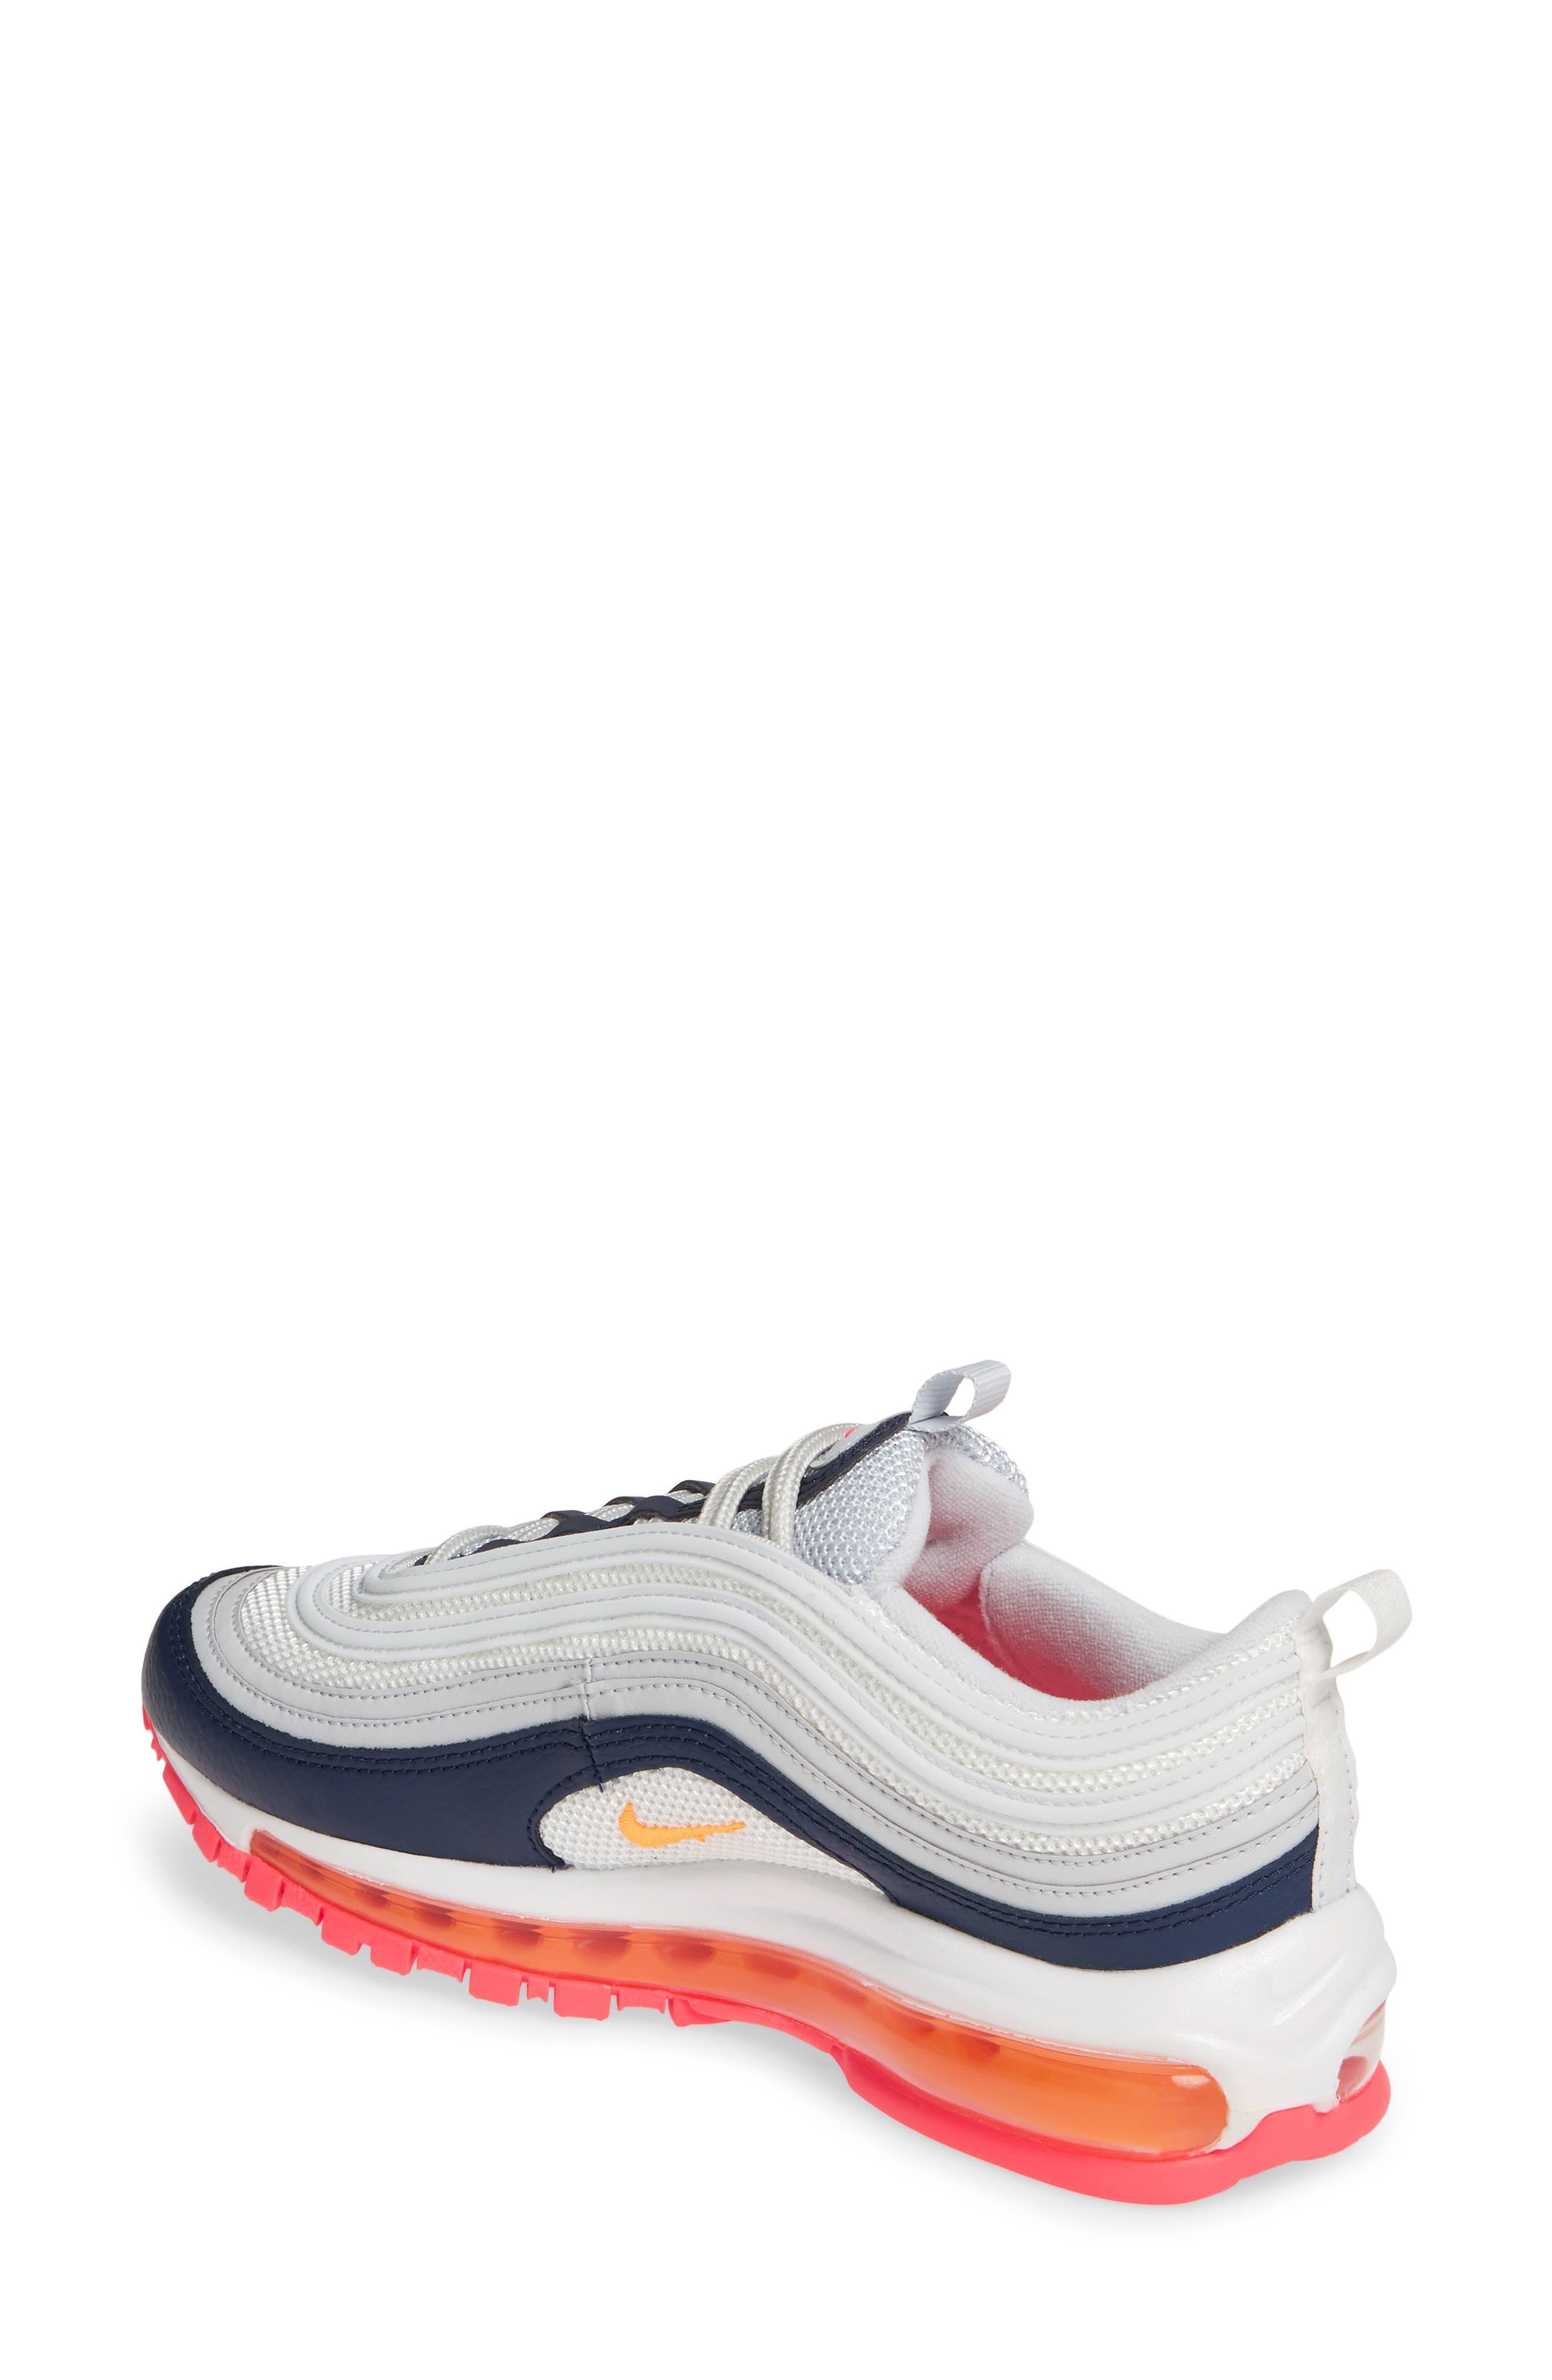 NIKE, Air Max 97 Sneaker, Alternate thumbnail 2, color, PLATINUM/ LASER ORANGE/ NAVY